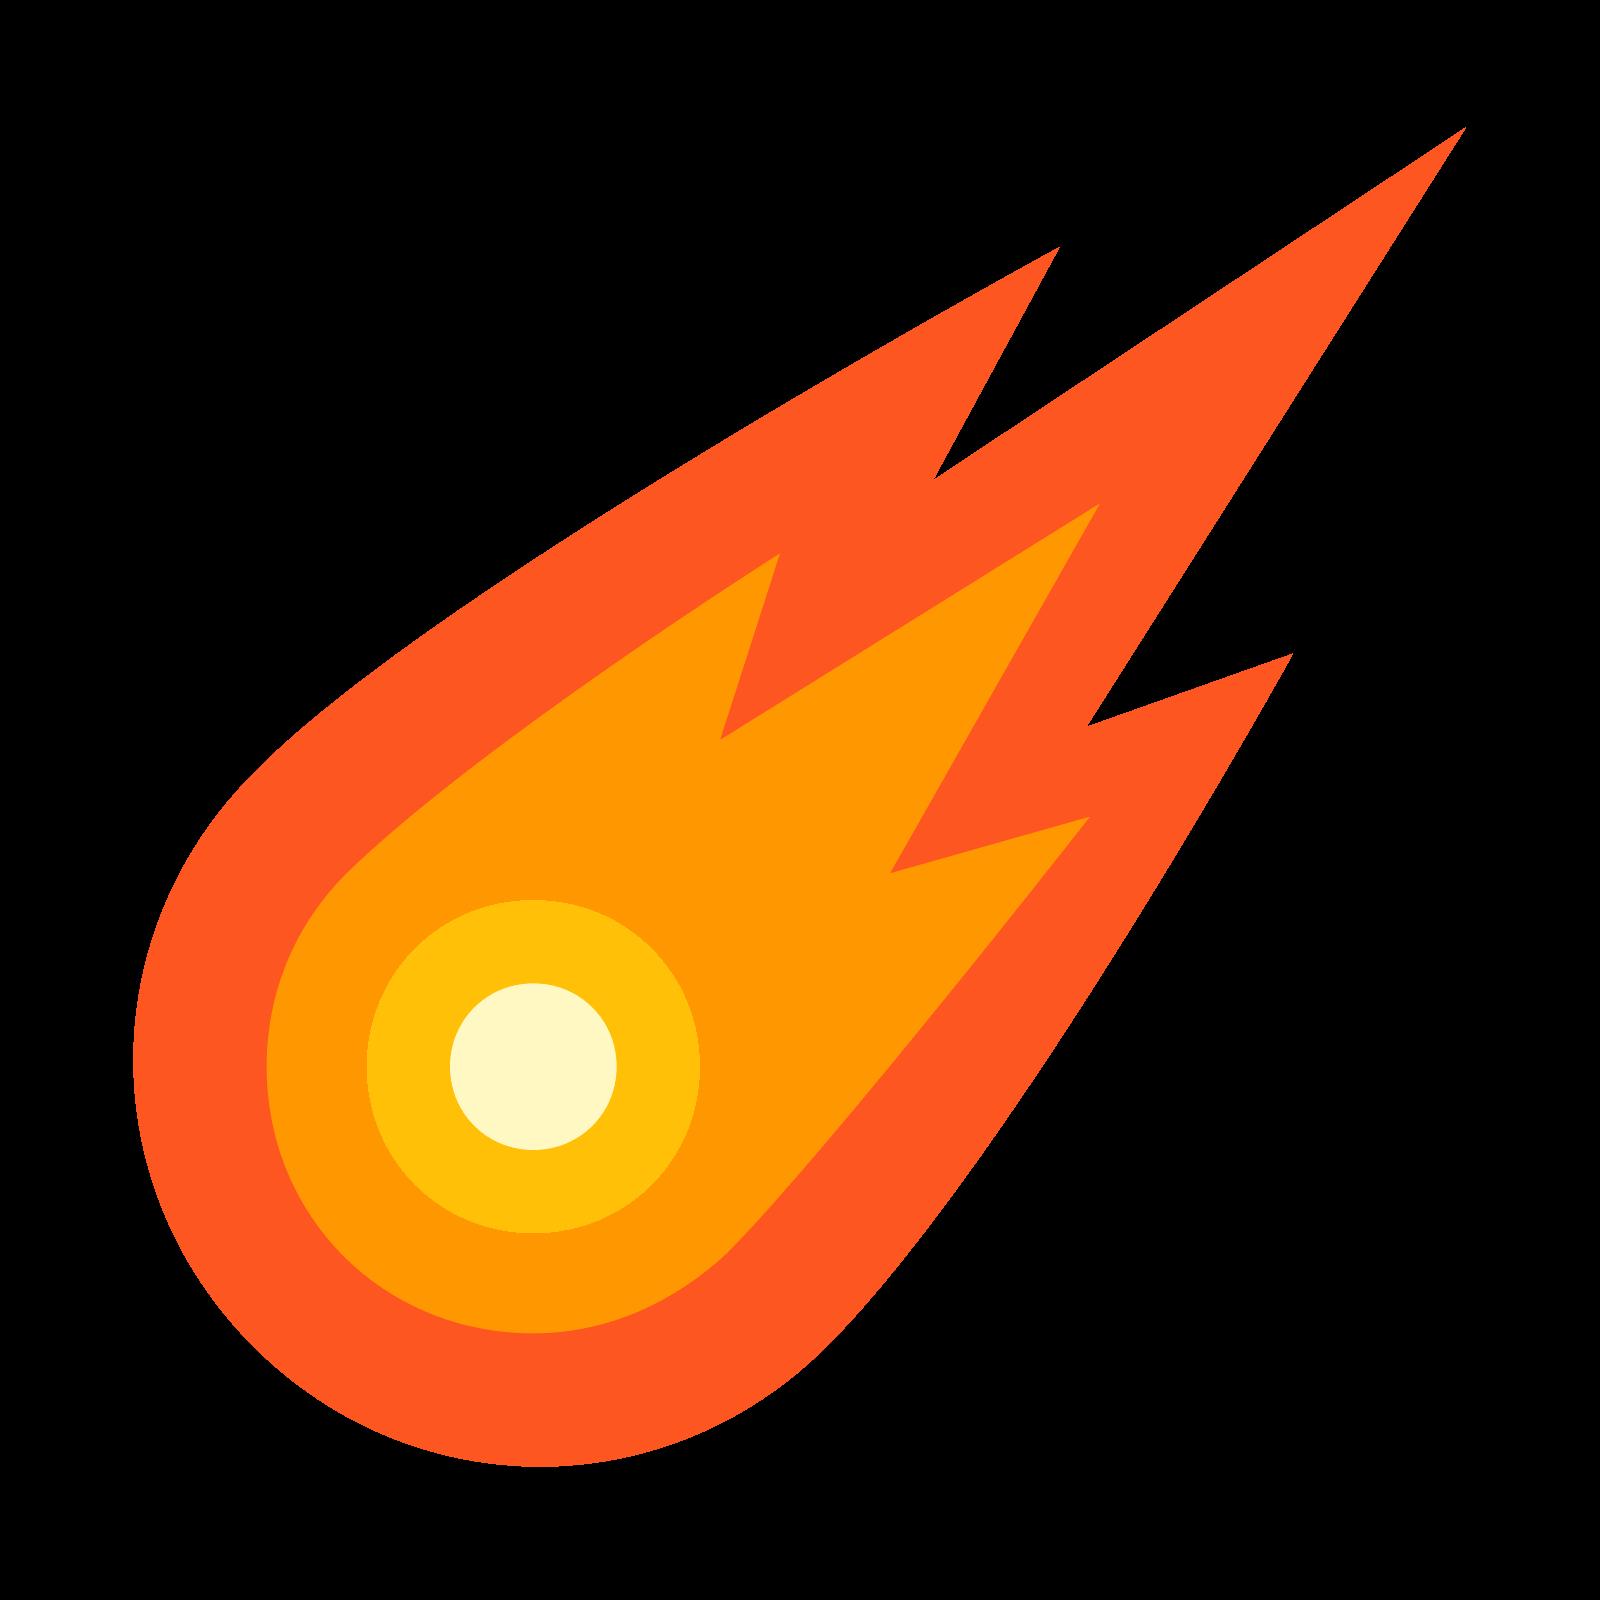 Computer icons meteor transprent. Comet clipart meteoroid